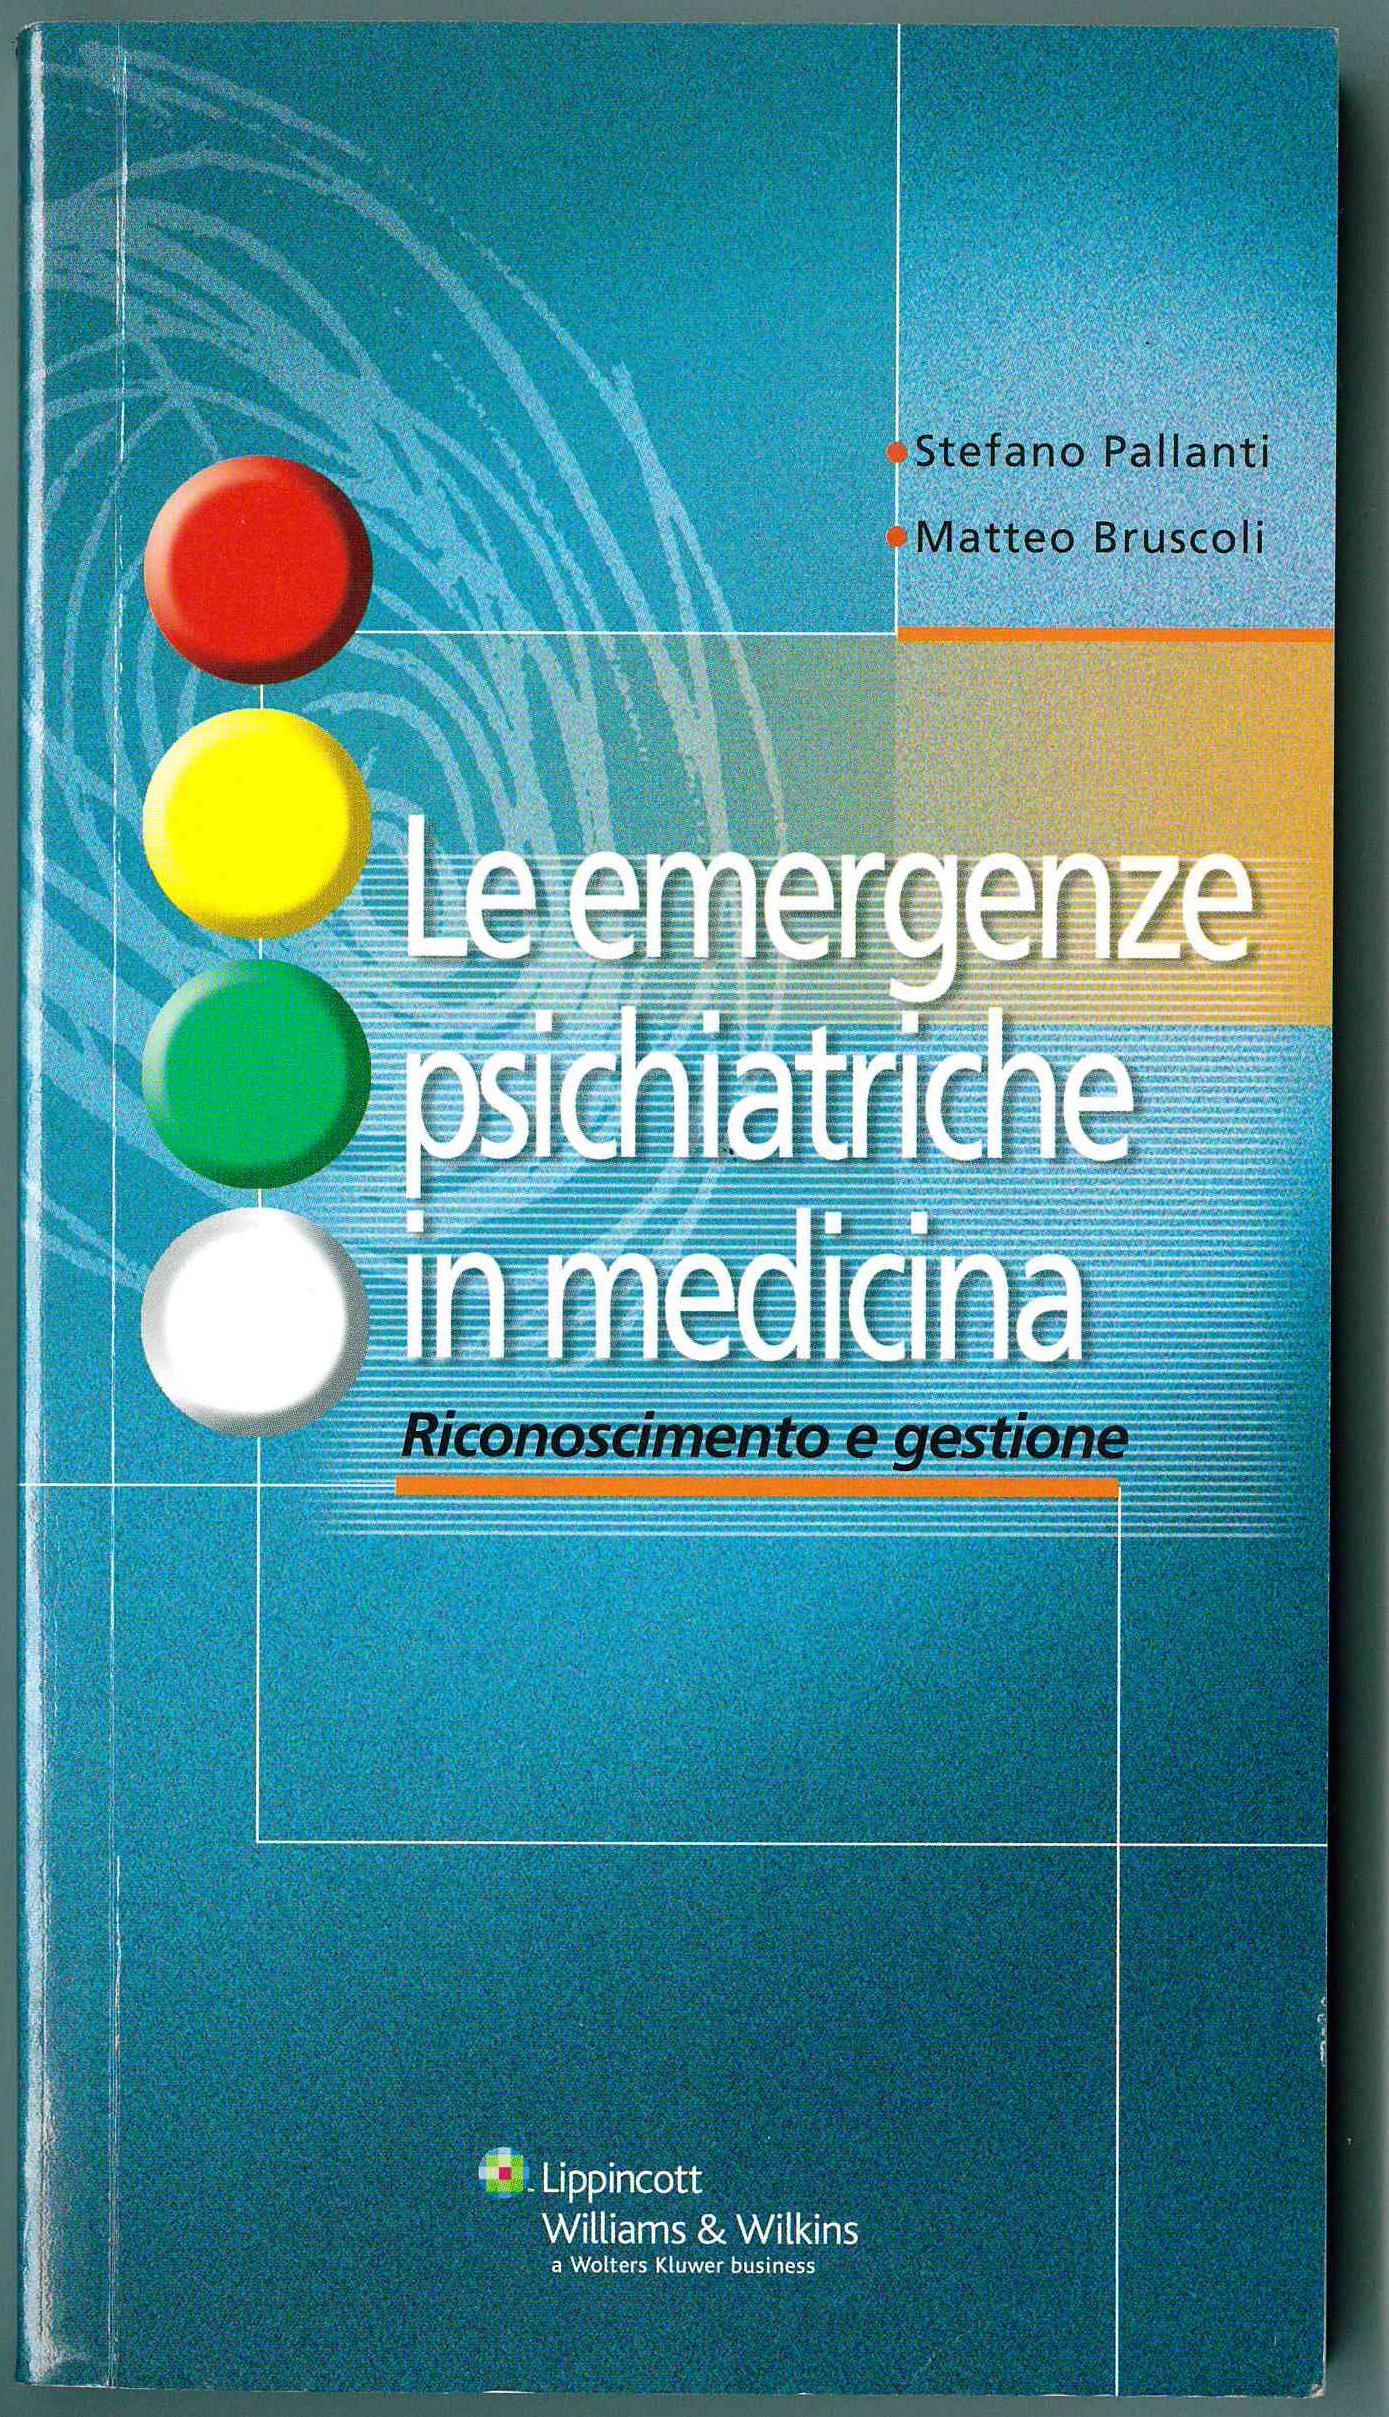 Le emergenze psichiatriche in medicina